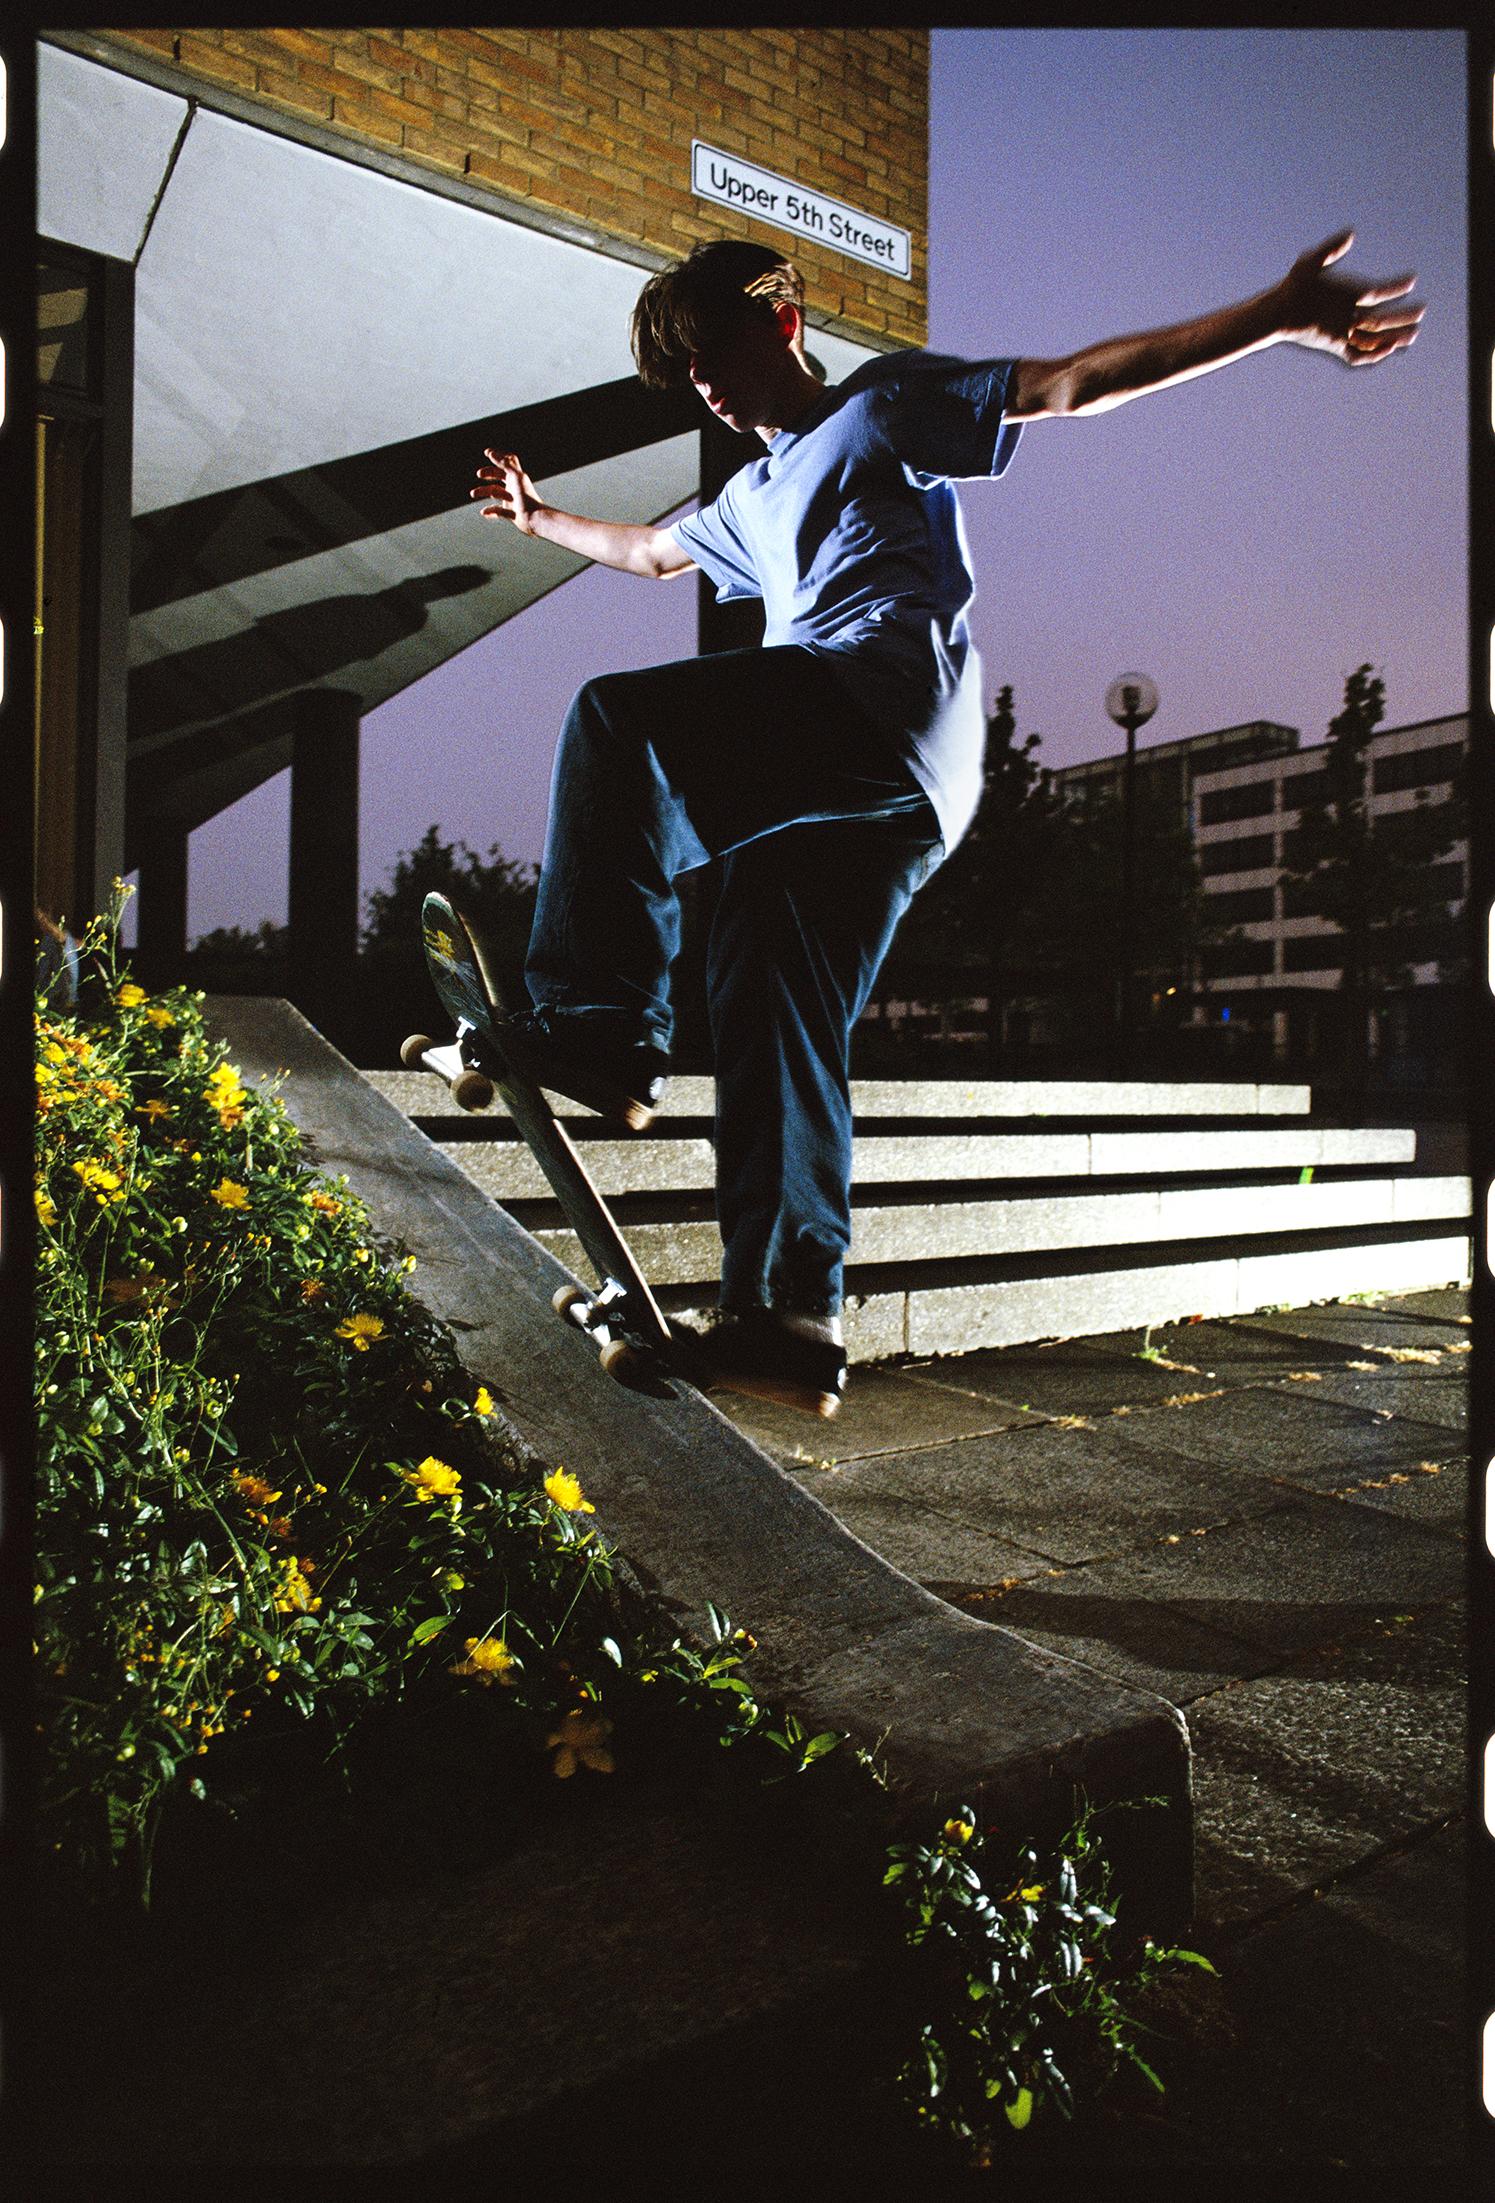 Tom Penny, frontside bluntslide, Upper 5th Street, Milton Keynes, 1993. photo: Wig Worland